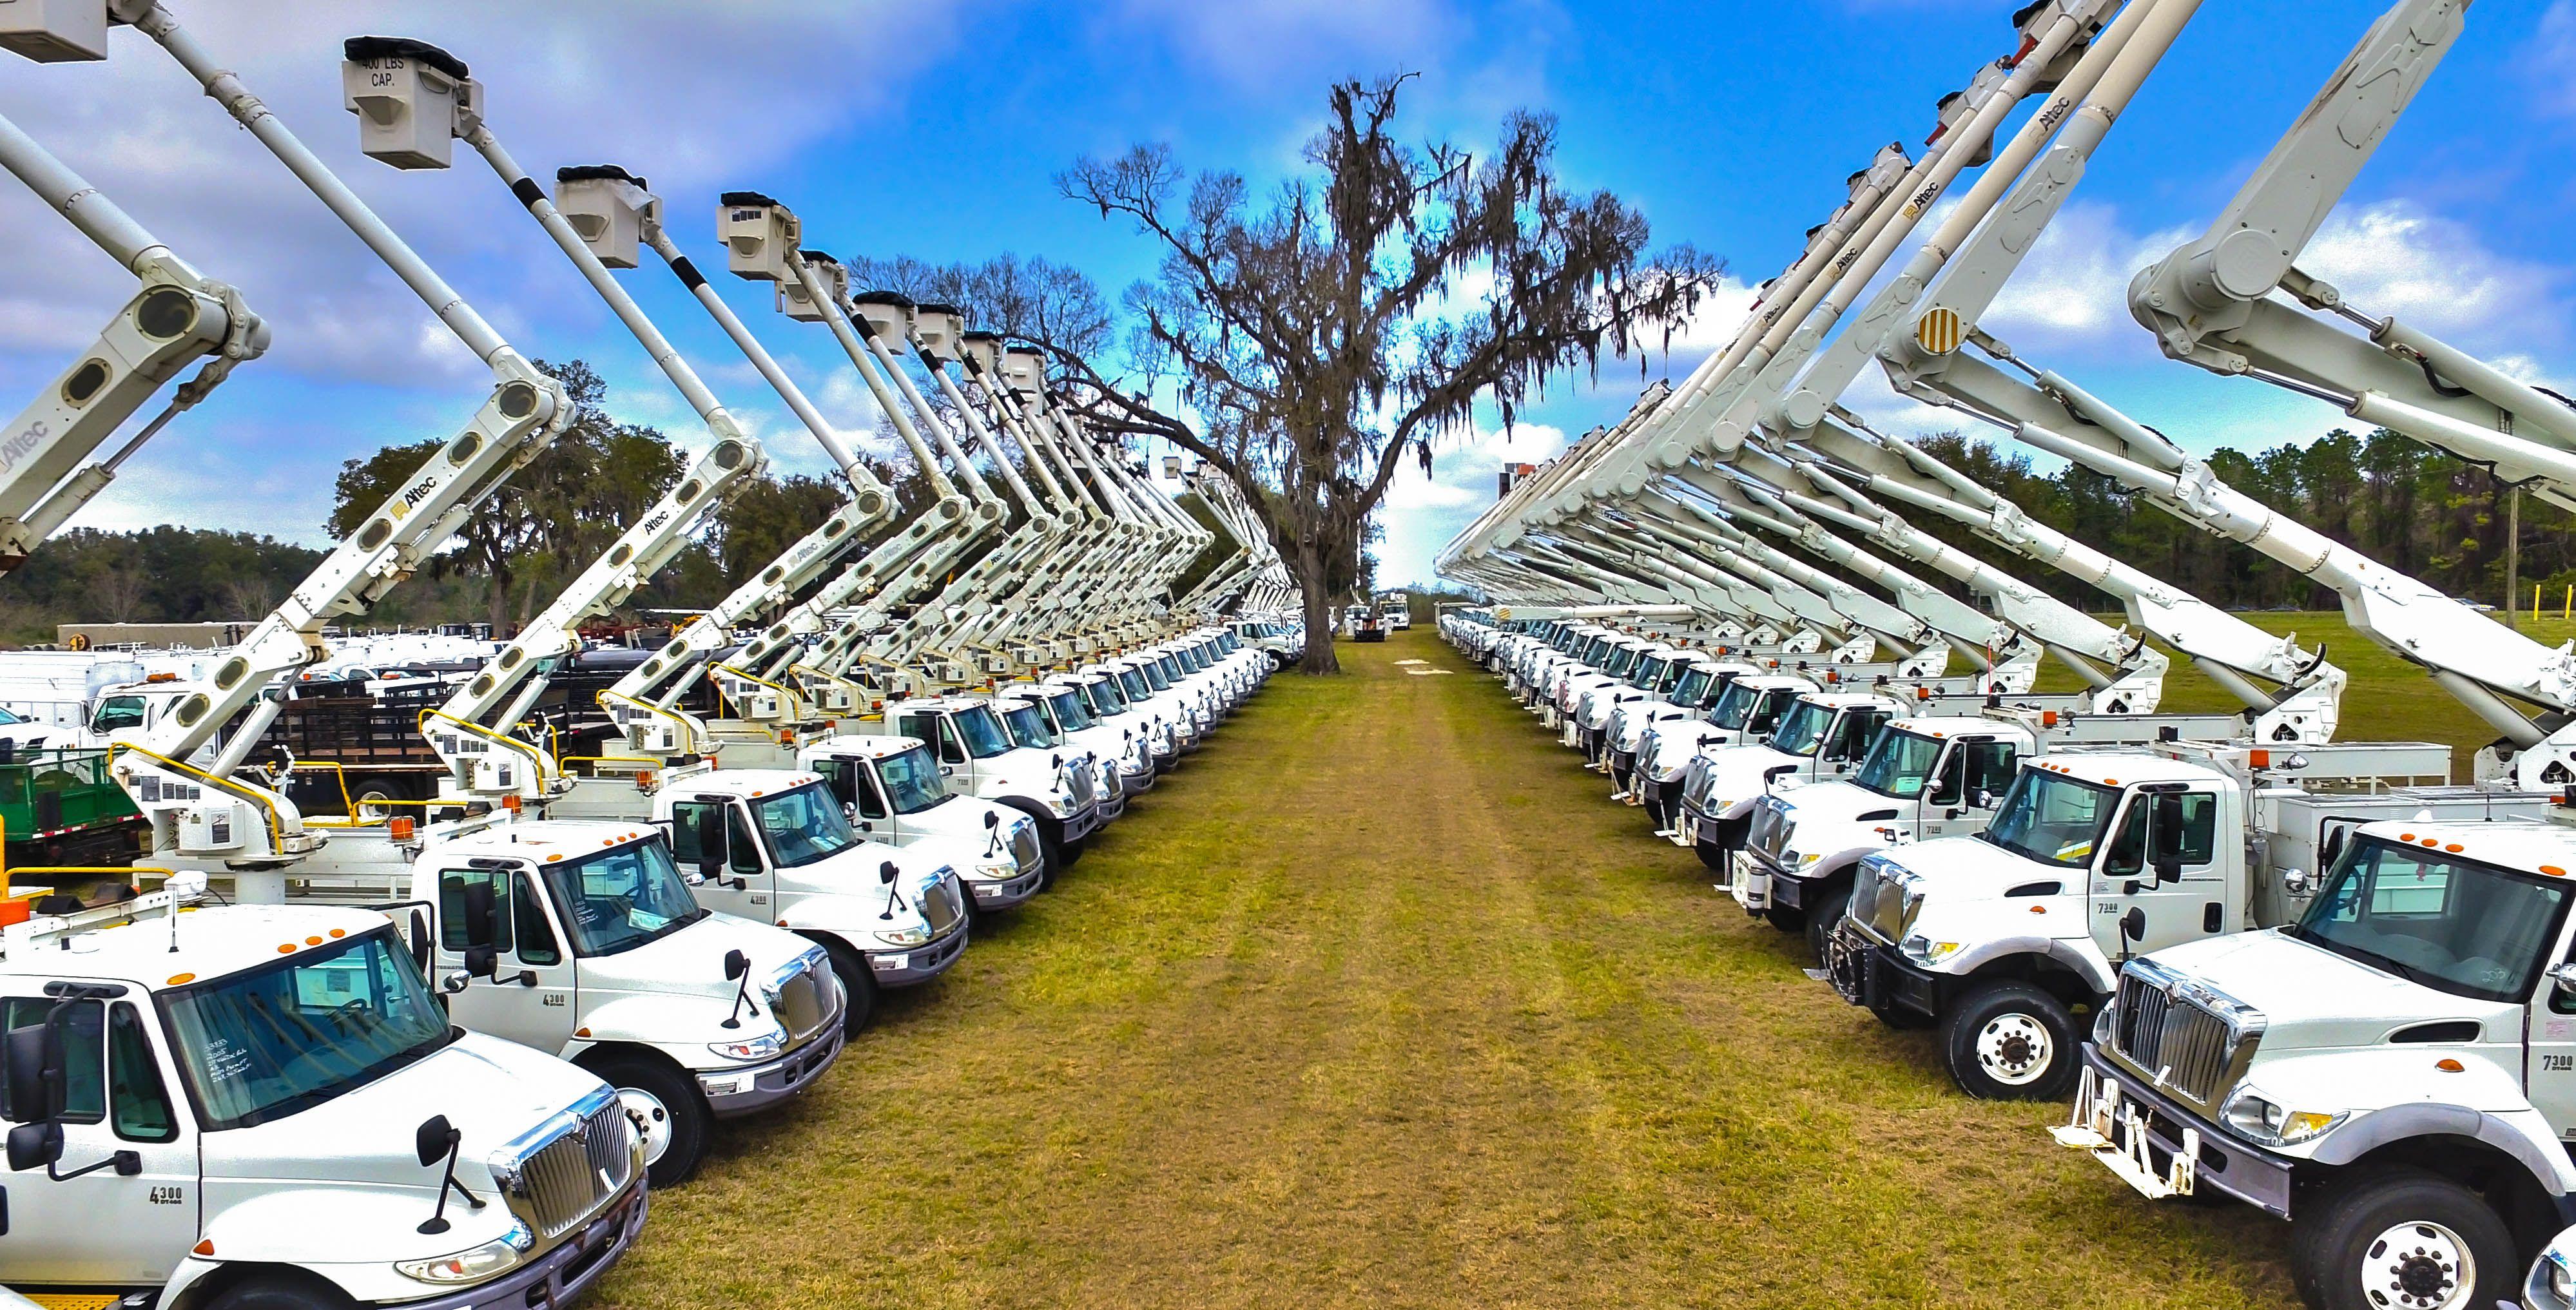 Used Bucket Trucks Sell At J J Kane Public Auction In Ocala Fl Ocala Auction Bucket Truck